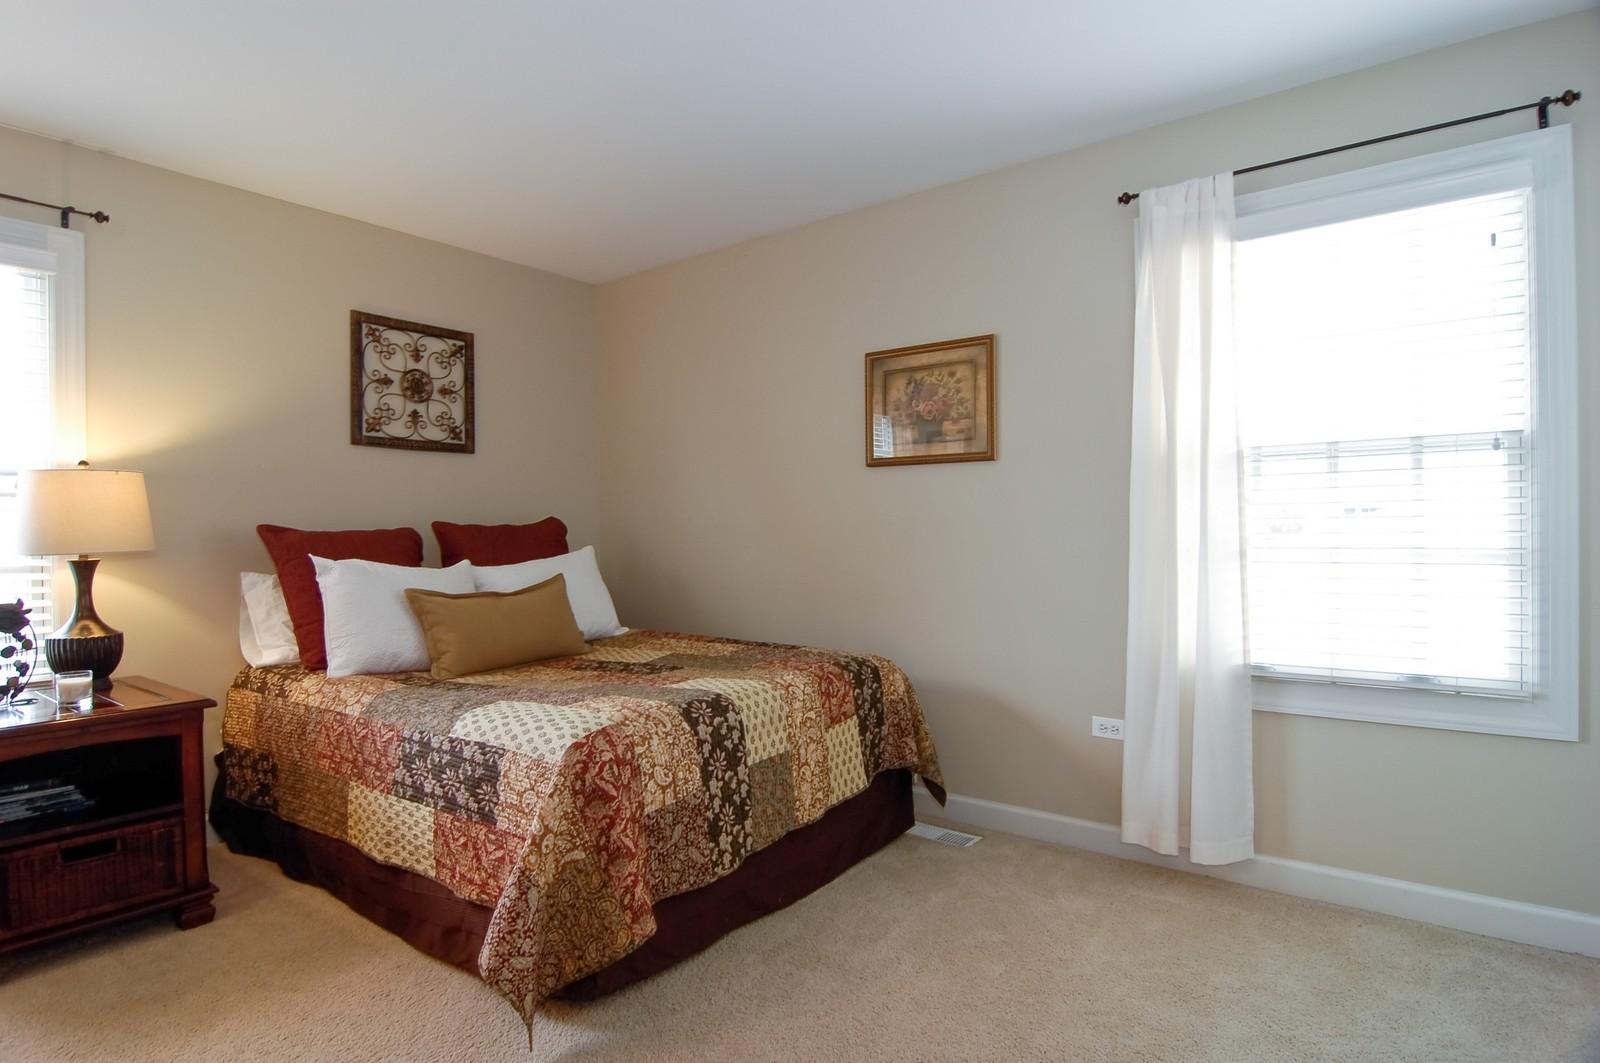 Real Estate Photography - 203 E. Lincoln, Wheaton, IL, 60187 - 4th Bedroom (Jack and Jill)